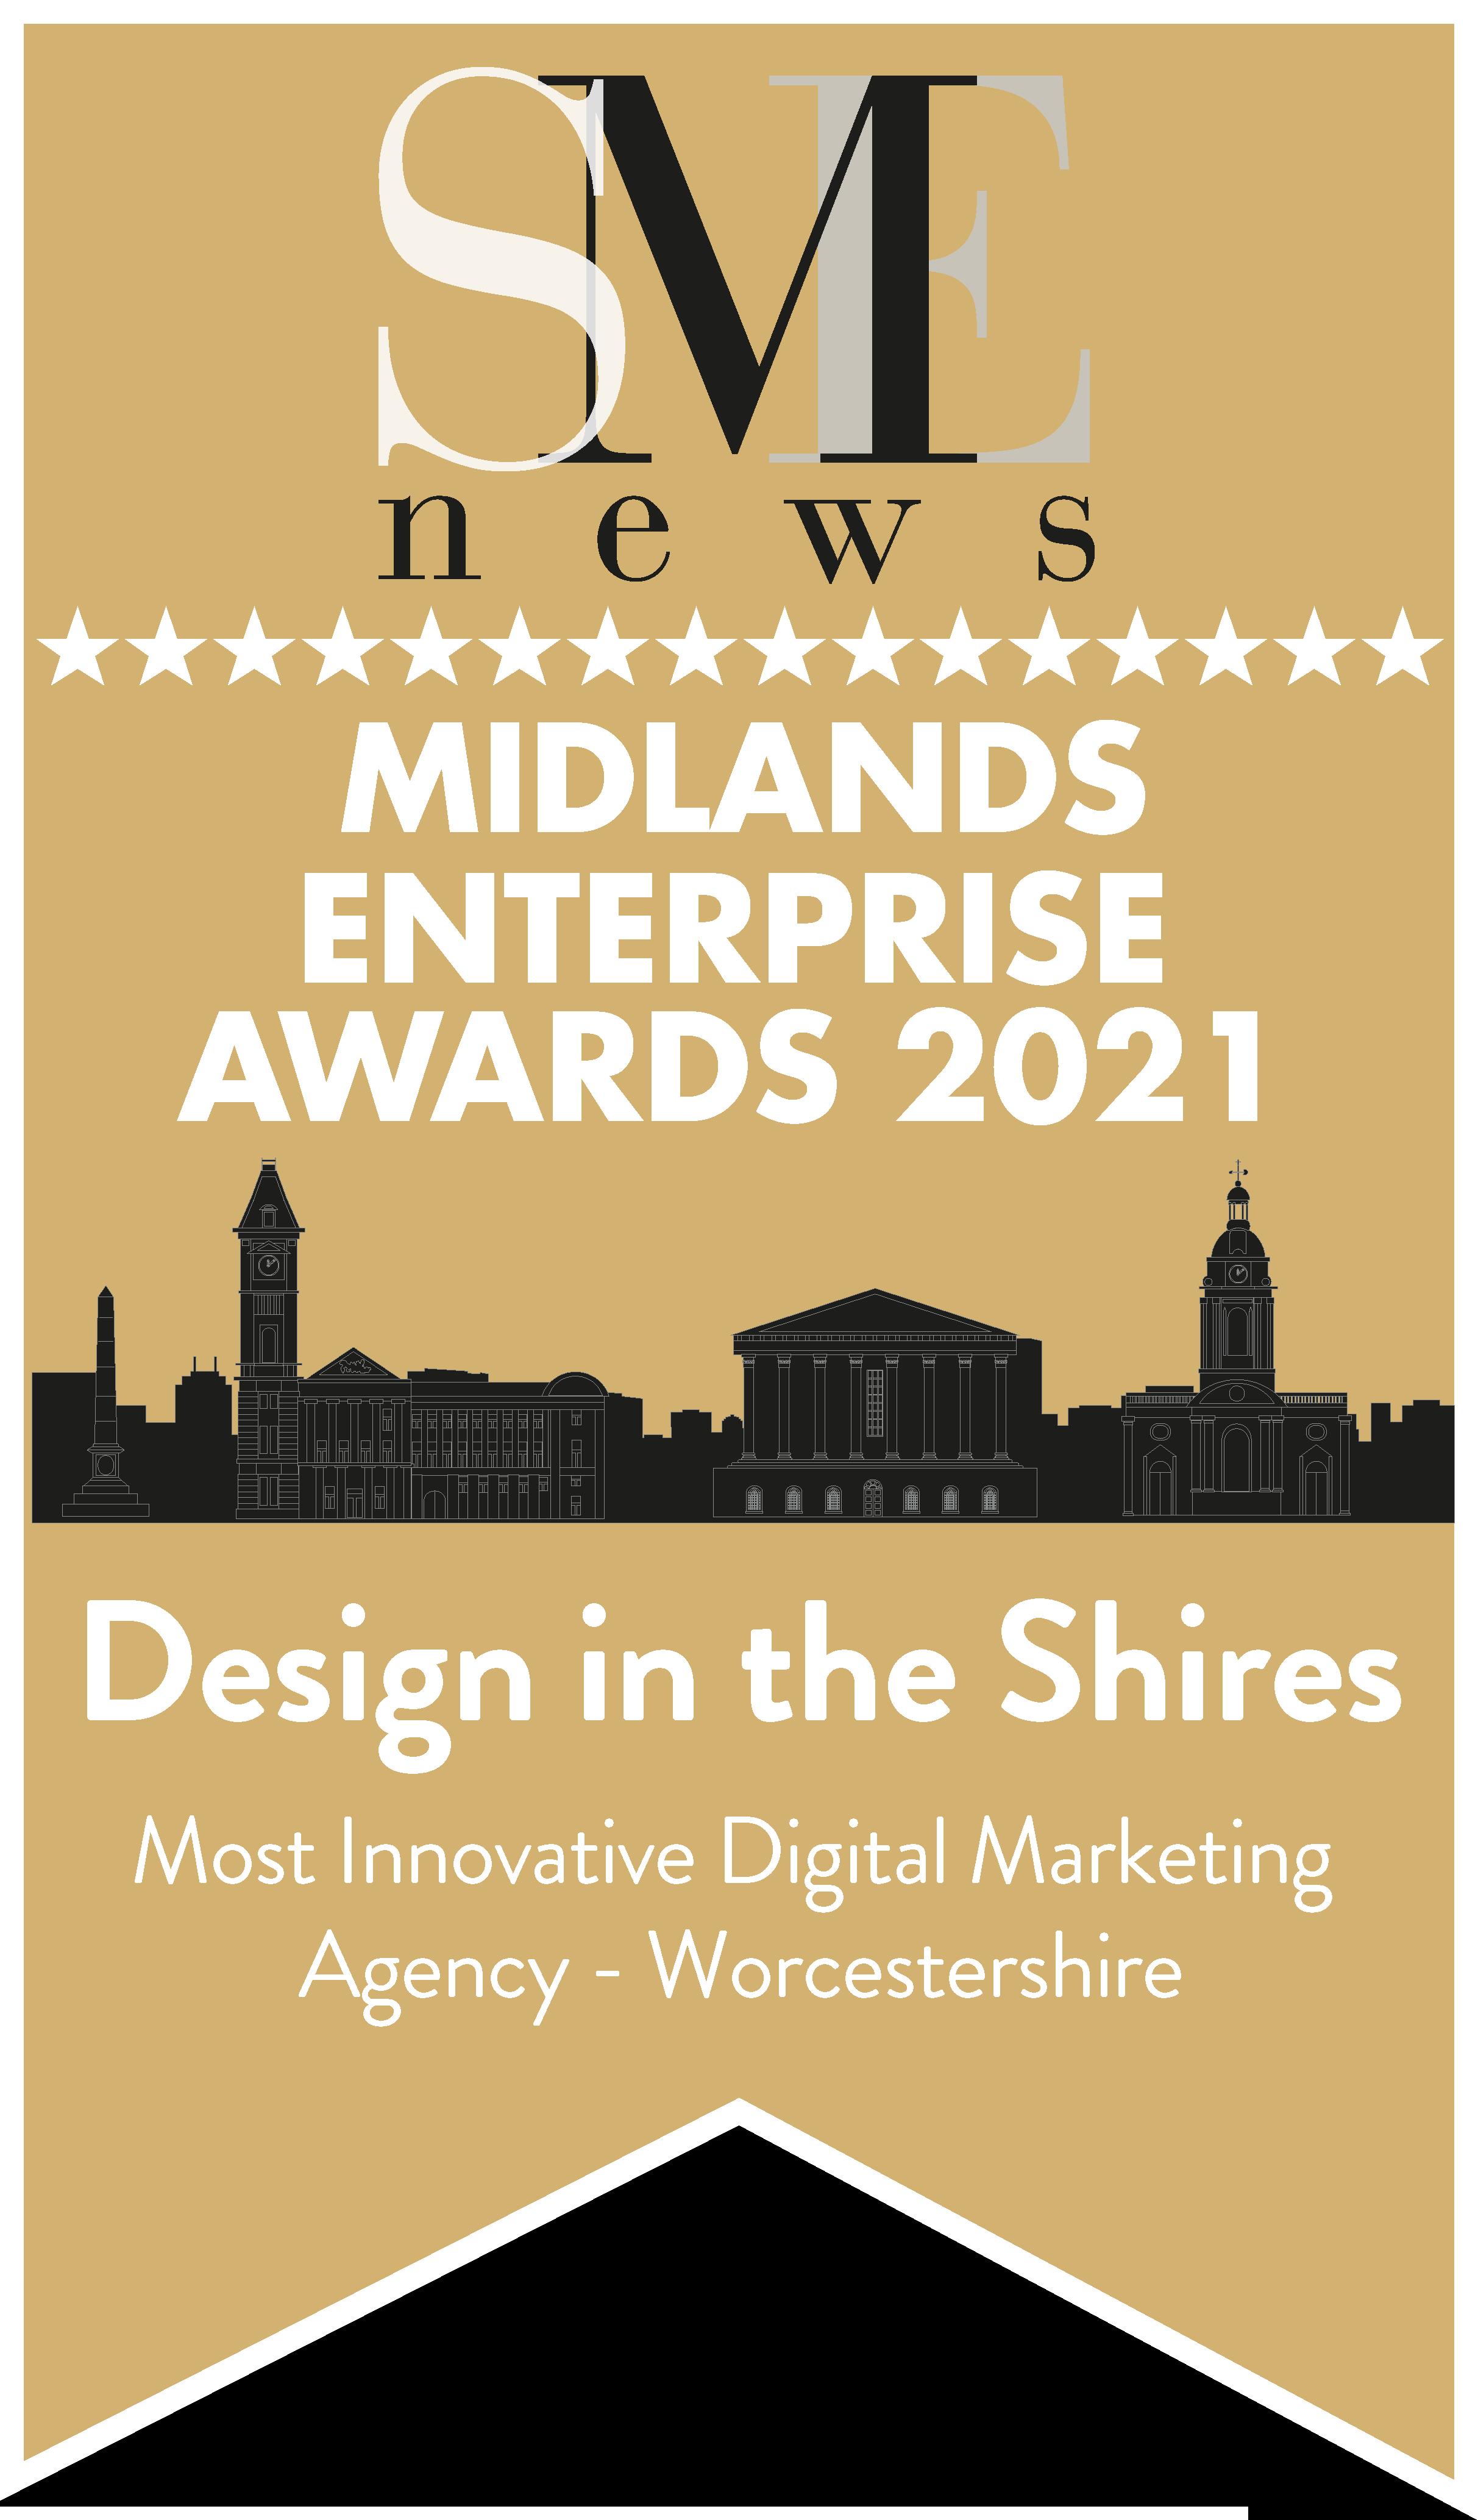 SME News Award Logo | Design in the Shires - Malvern, Worcestershire